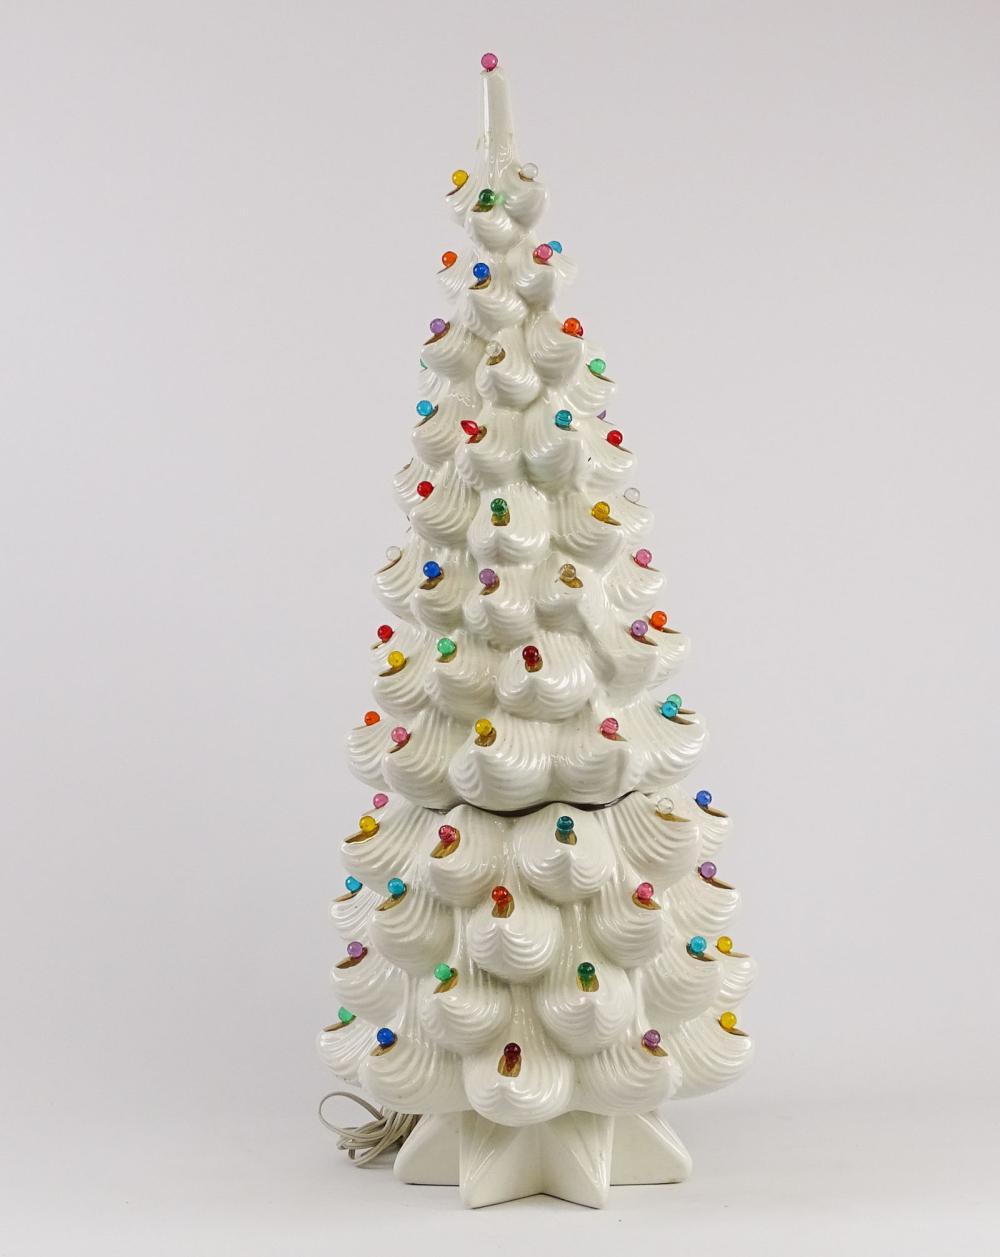 Vintage Light Up Ceramic Christmas Tree